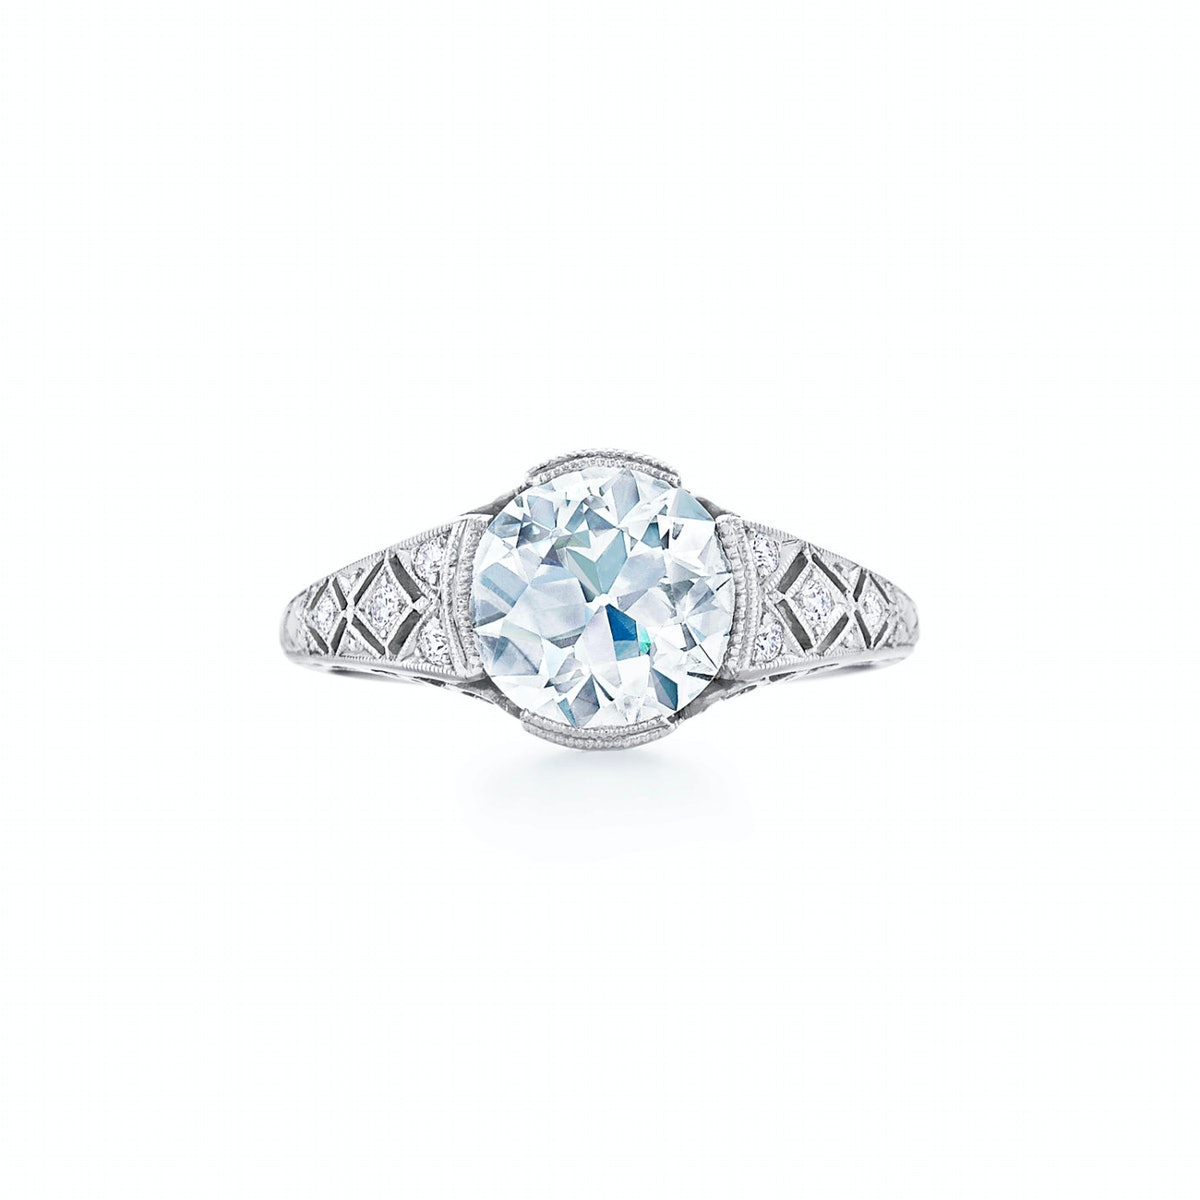 Vintage-Style Round Diamond Engagement Ring With Crosshatch Filigree